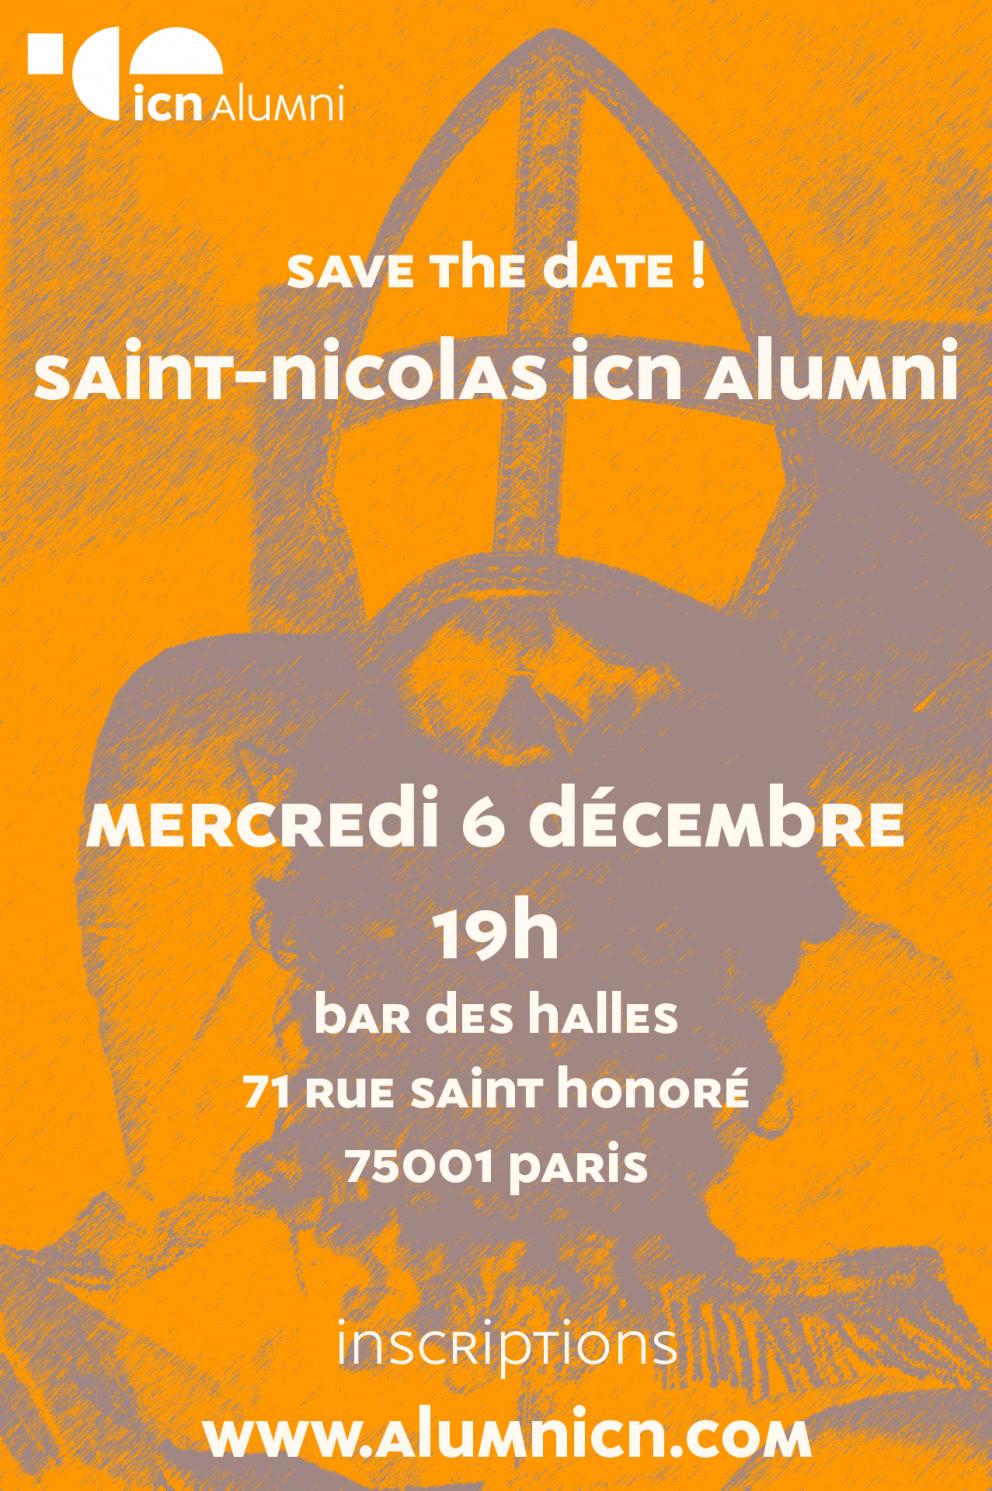 Saint Nicolas Paris Icn Alumni Be An Actor Of Your Own Network